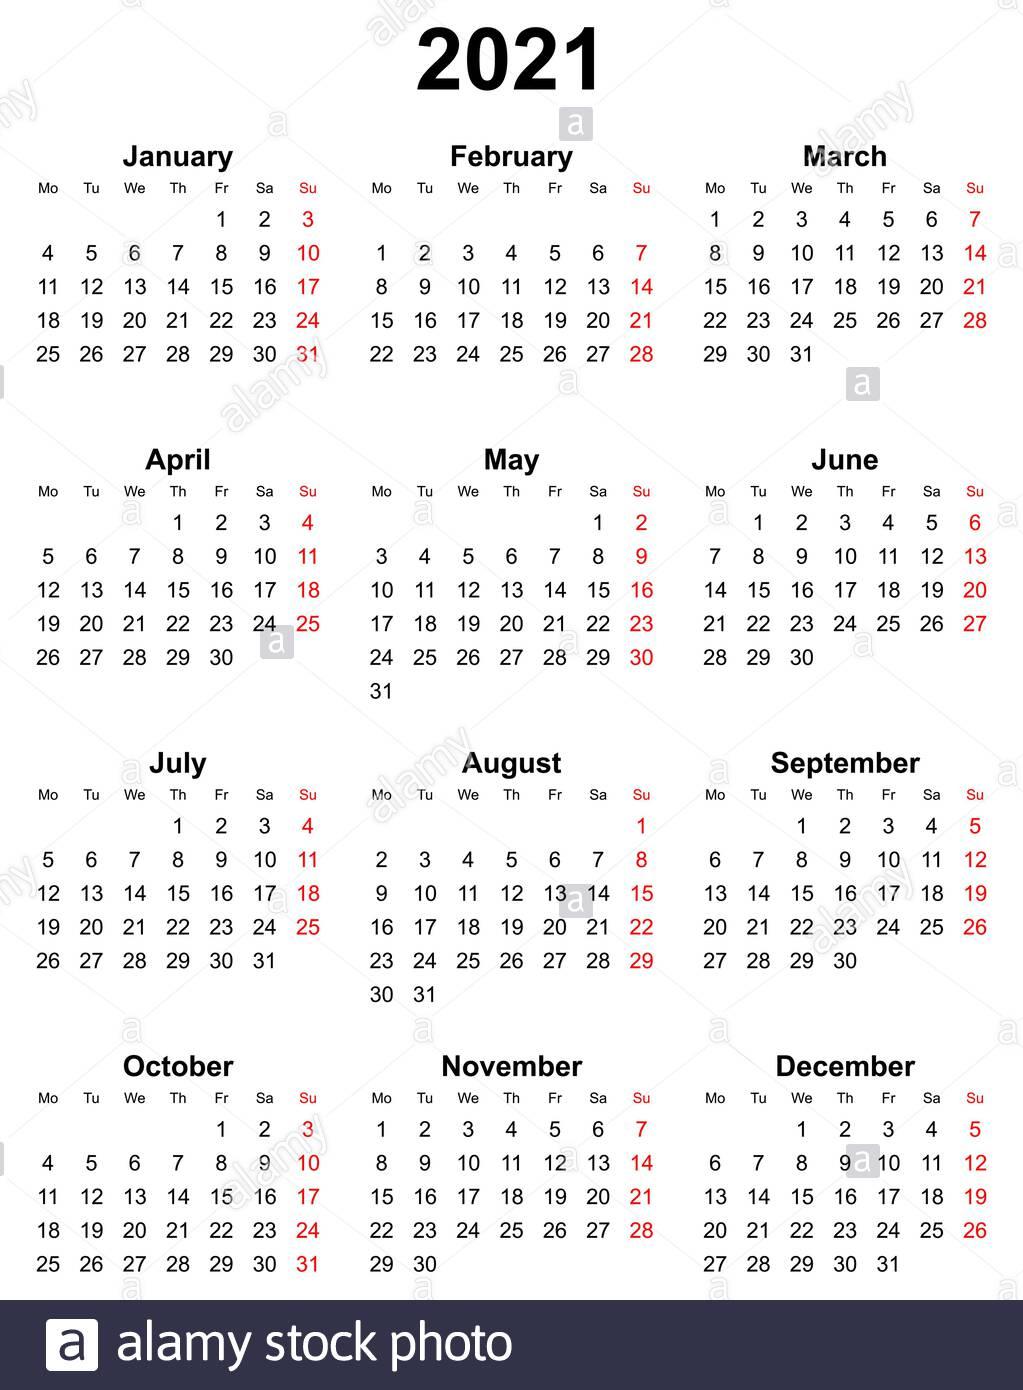 Simple Editable Vector Calendar For Year 2021 Sundays In Red